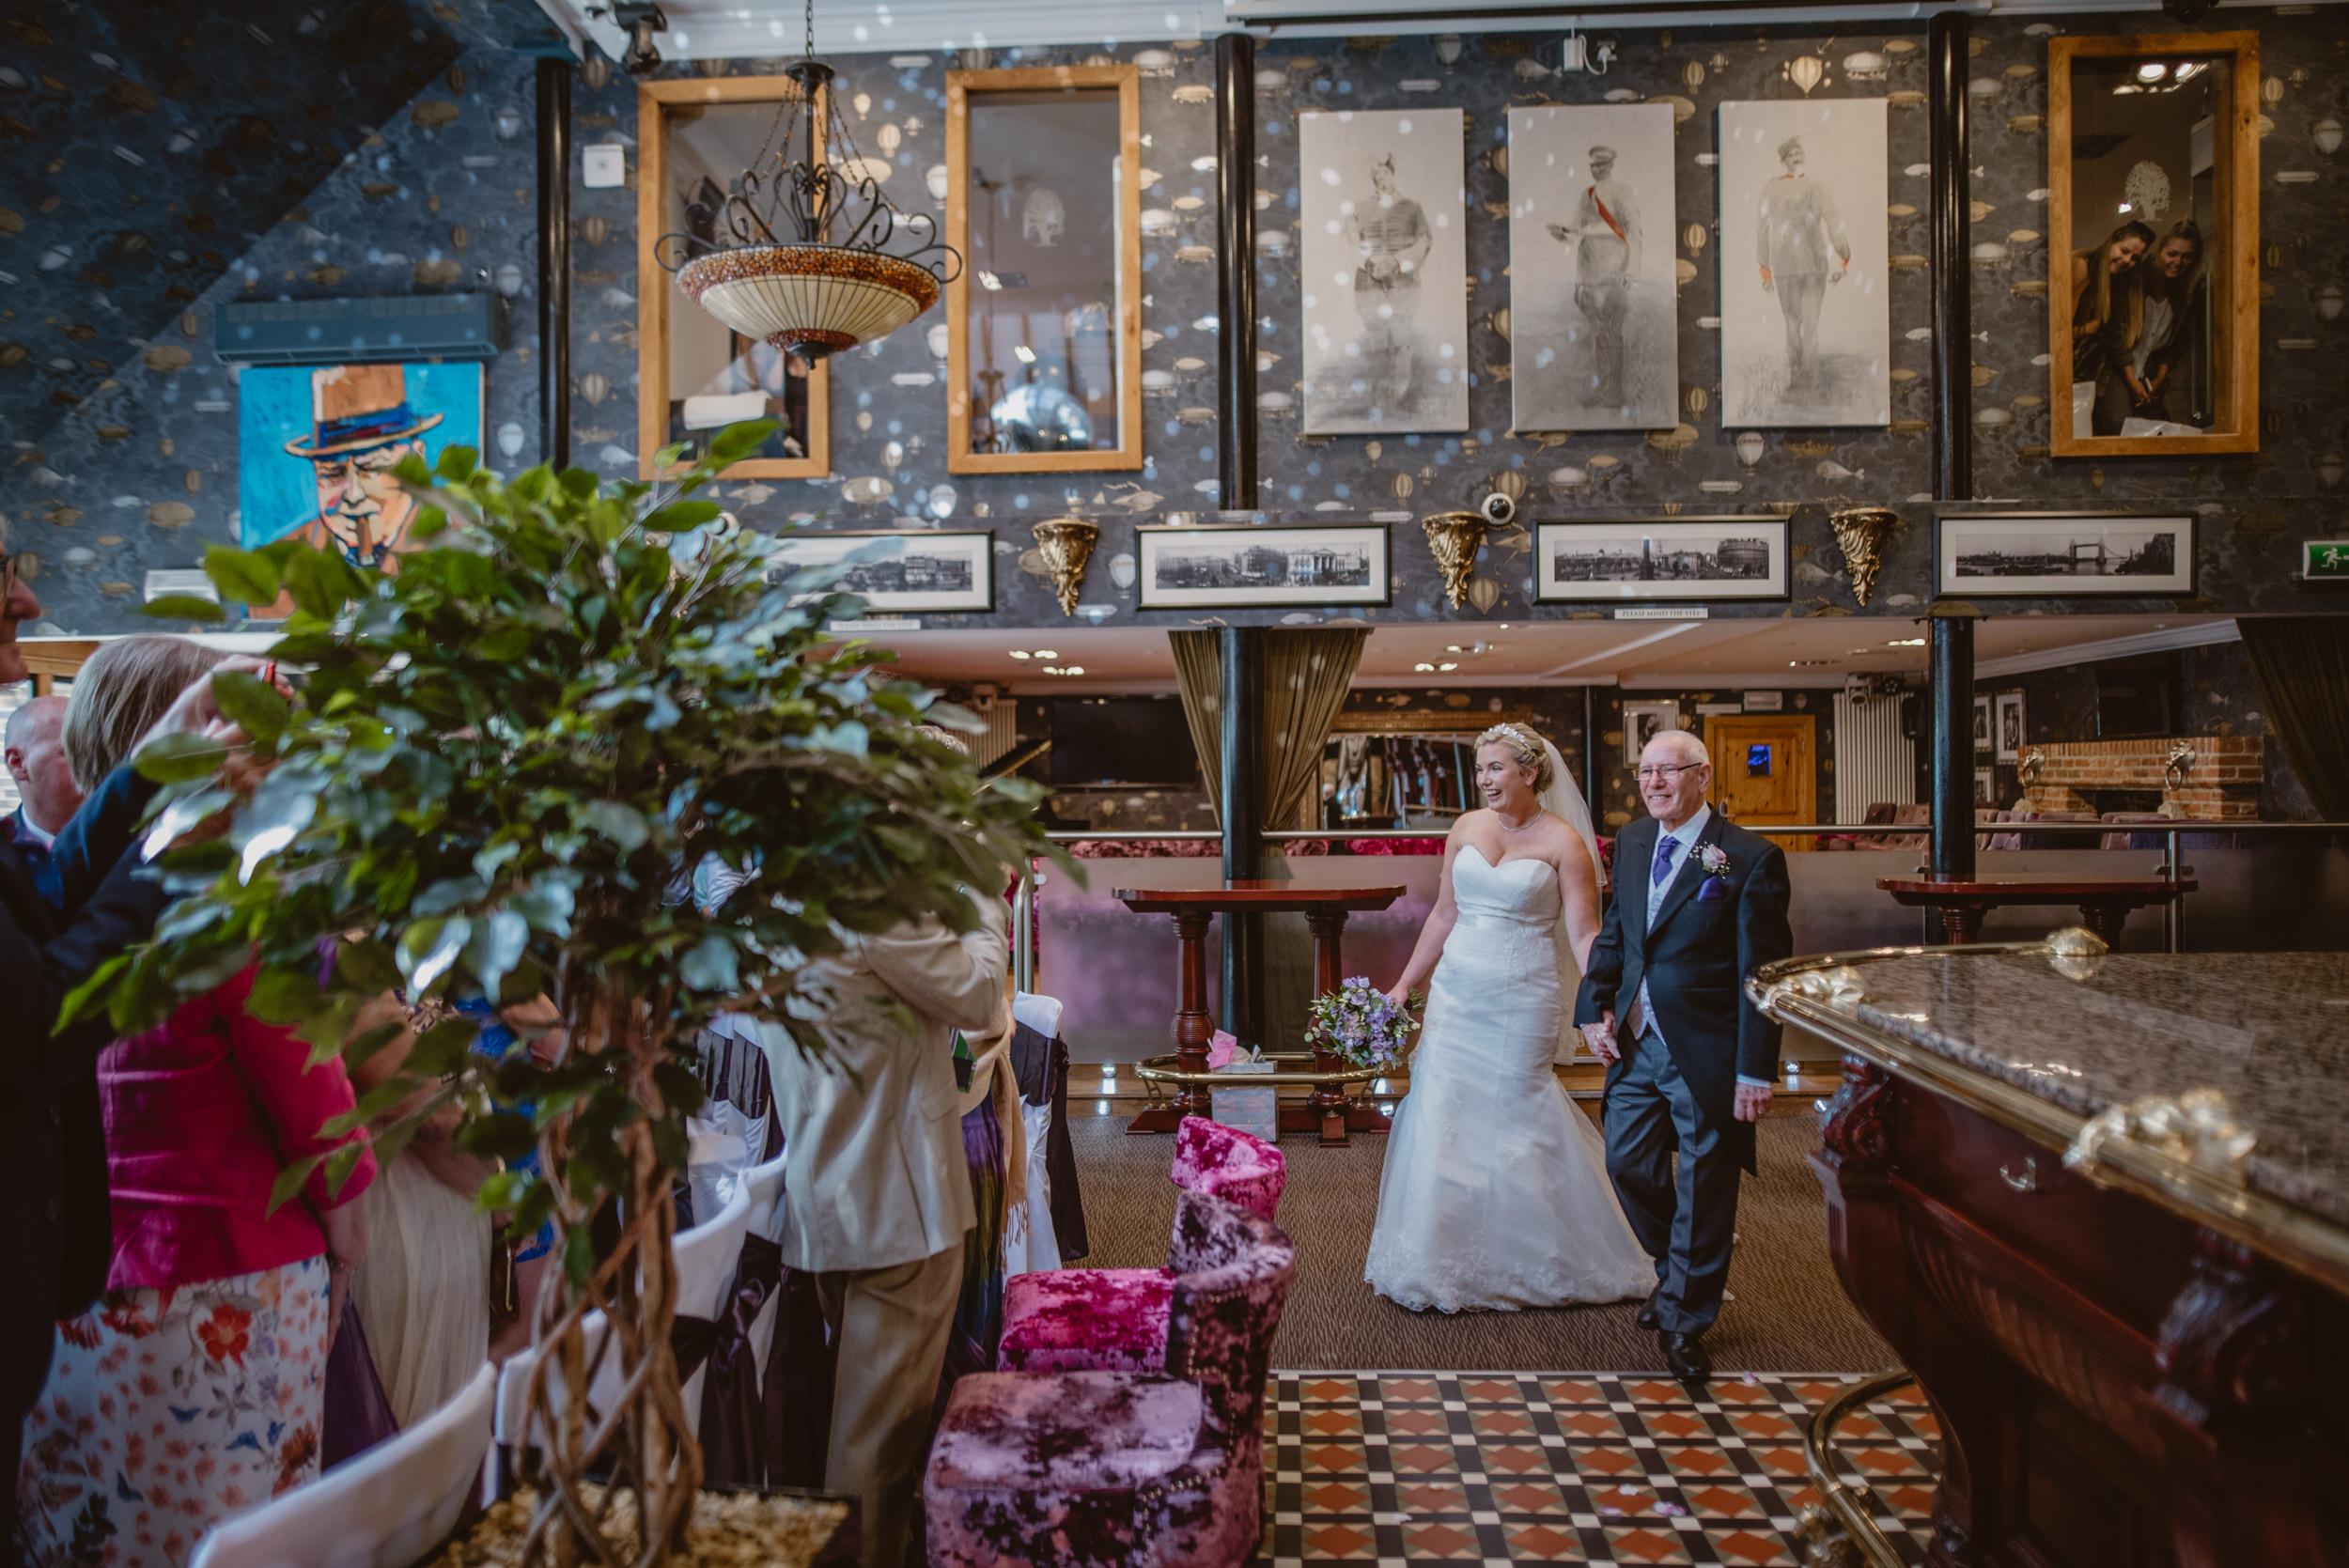 Chantelle-and-Stephen-Old-Thorns-Hotel-Wedding-Liphook-Manu-Mendoza-Wedding-Photography-176.jpg